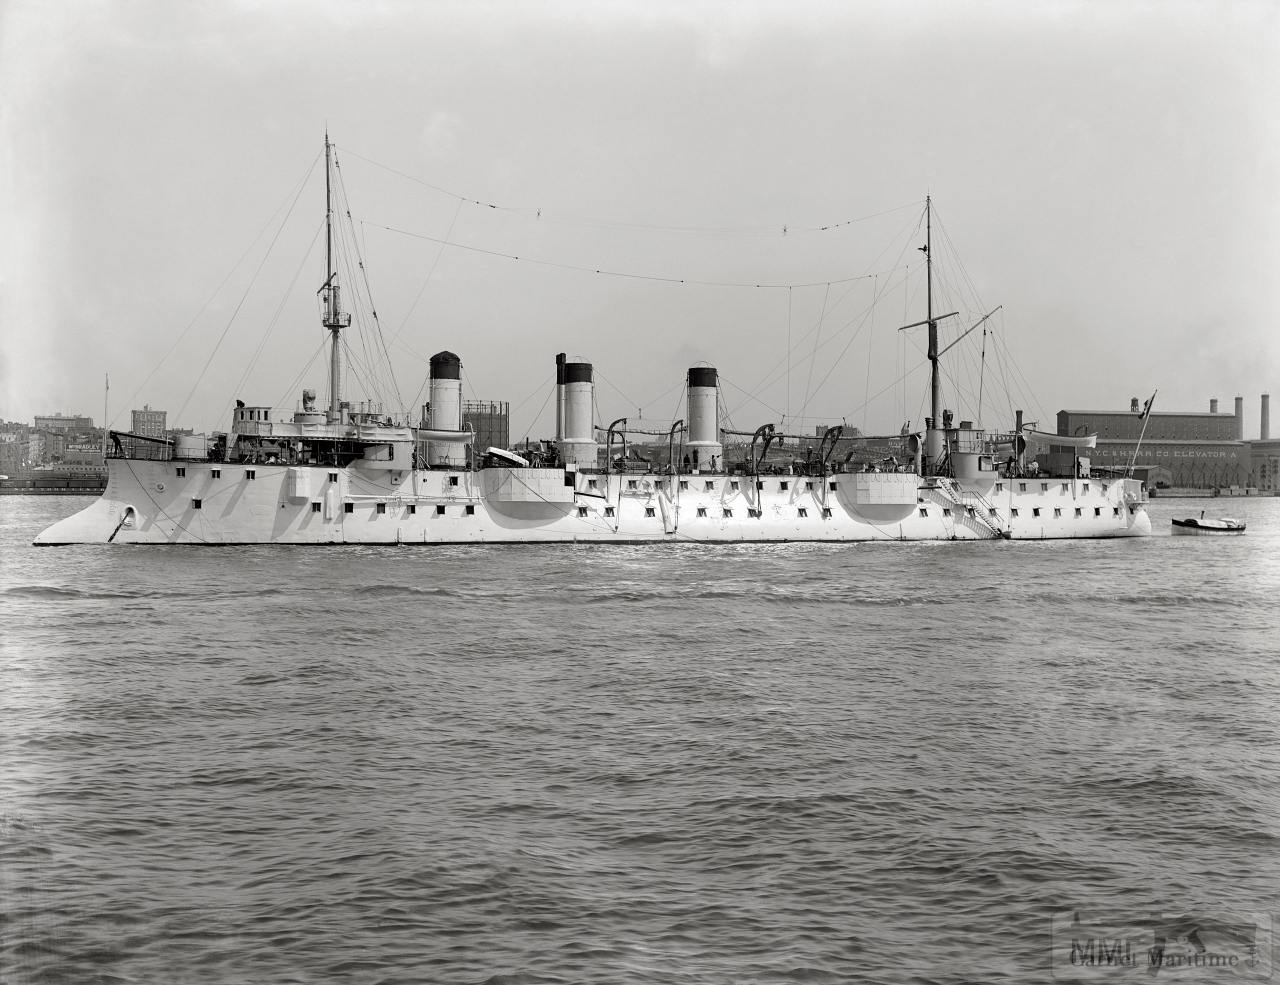 34235 - Крейсер Chasseloup-Laubat